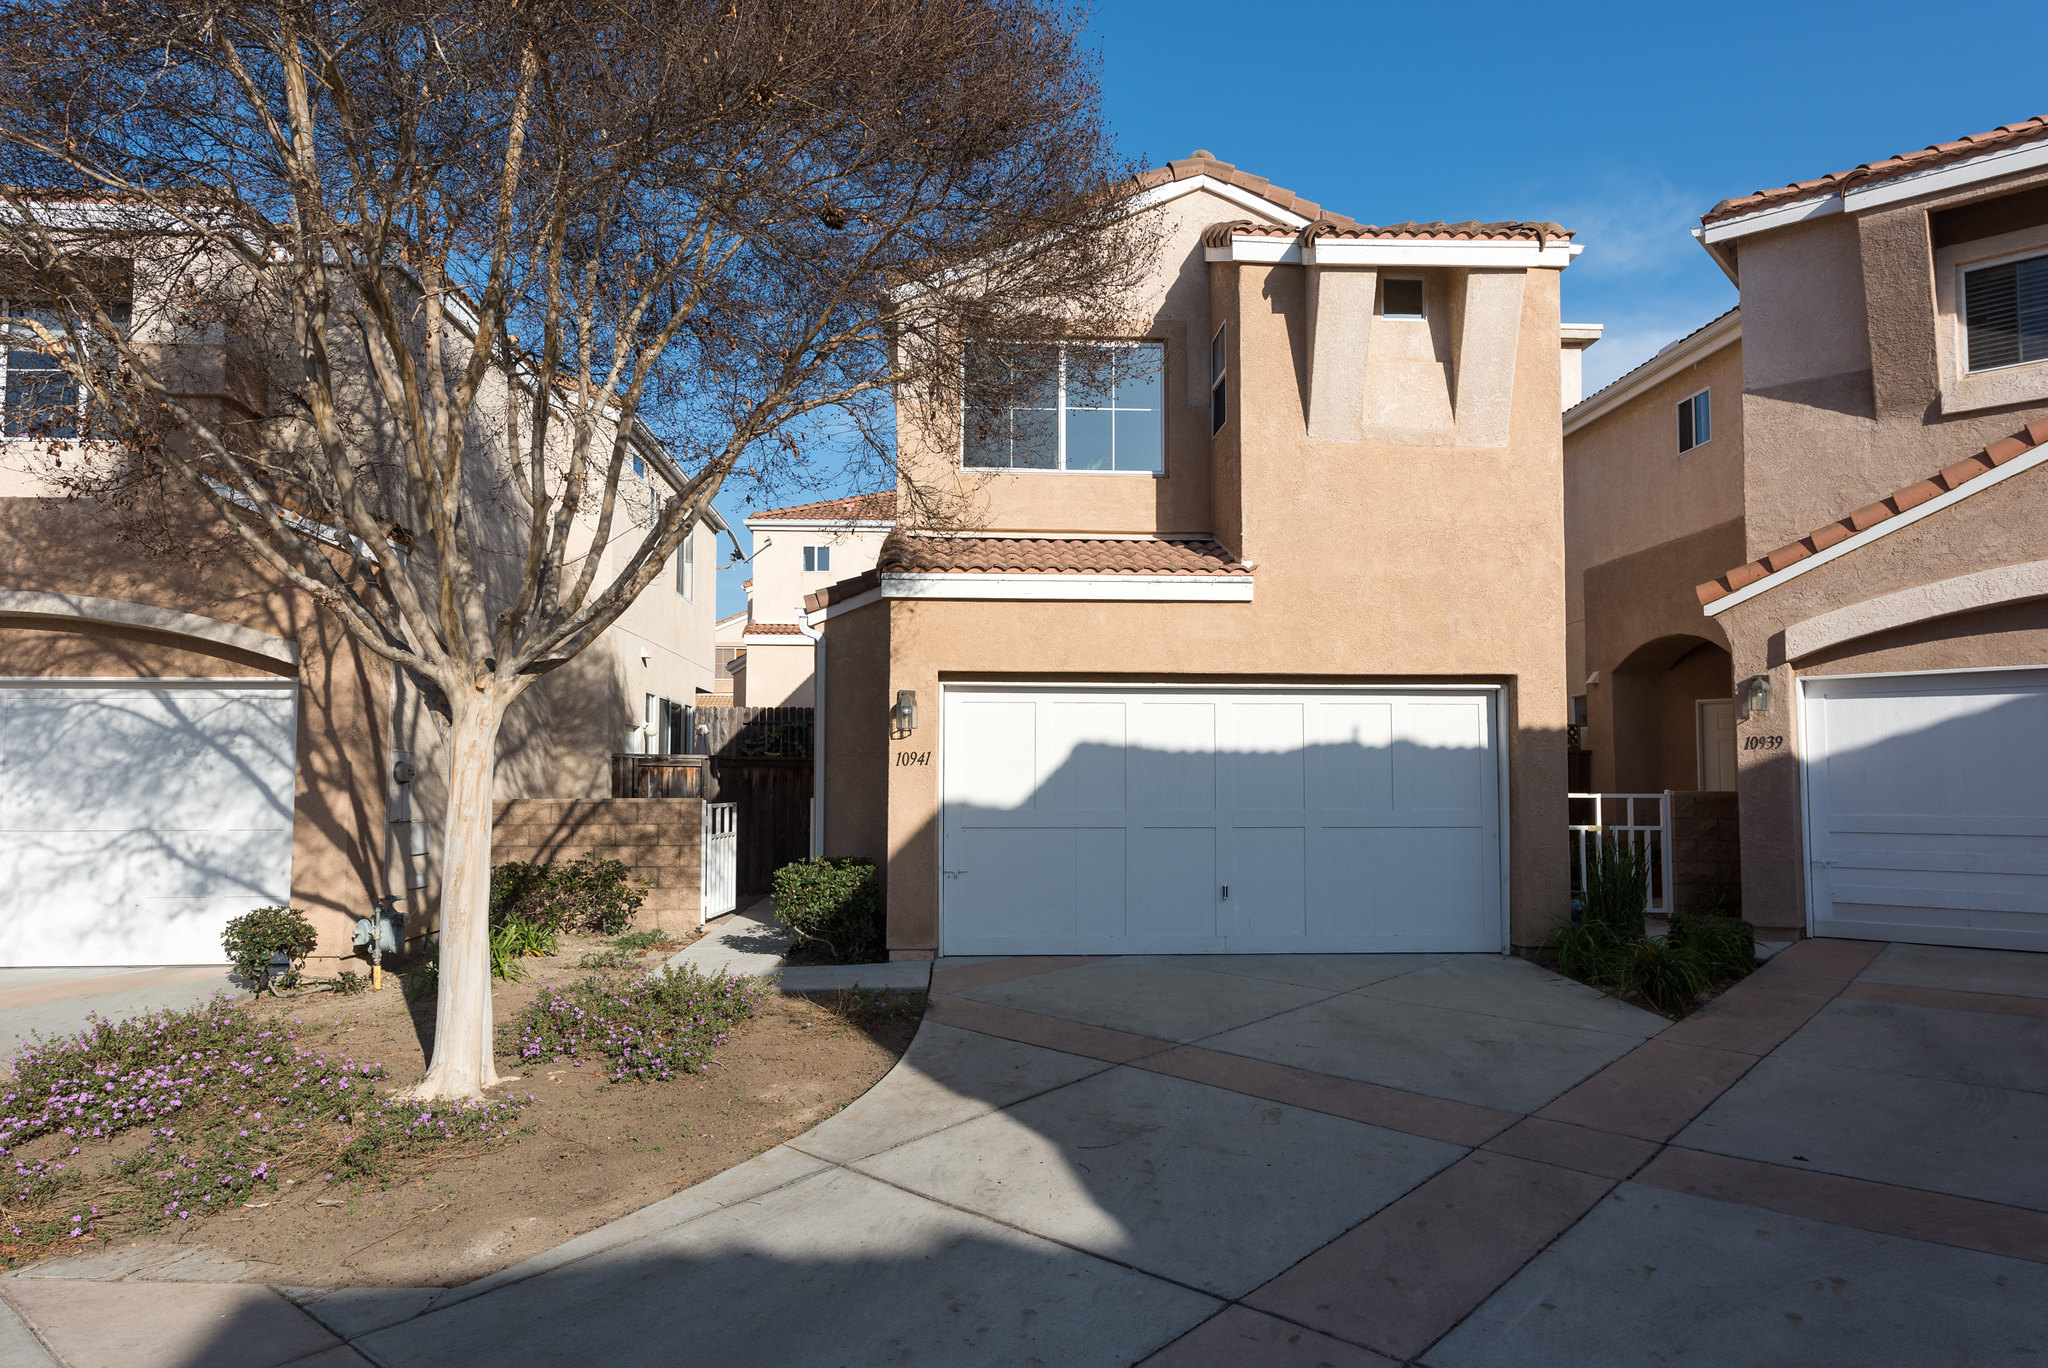 10941 Caminito Arcada, Scripps Ranch, San Diego, CA 92131